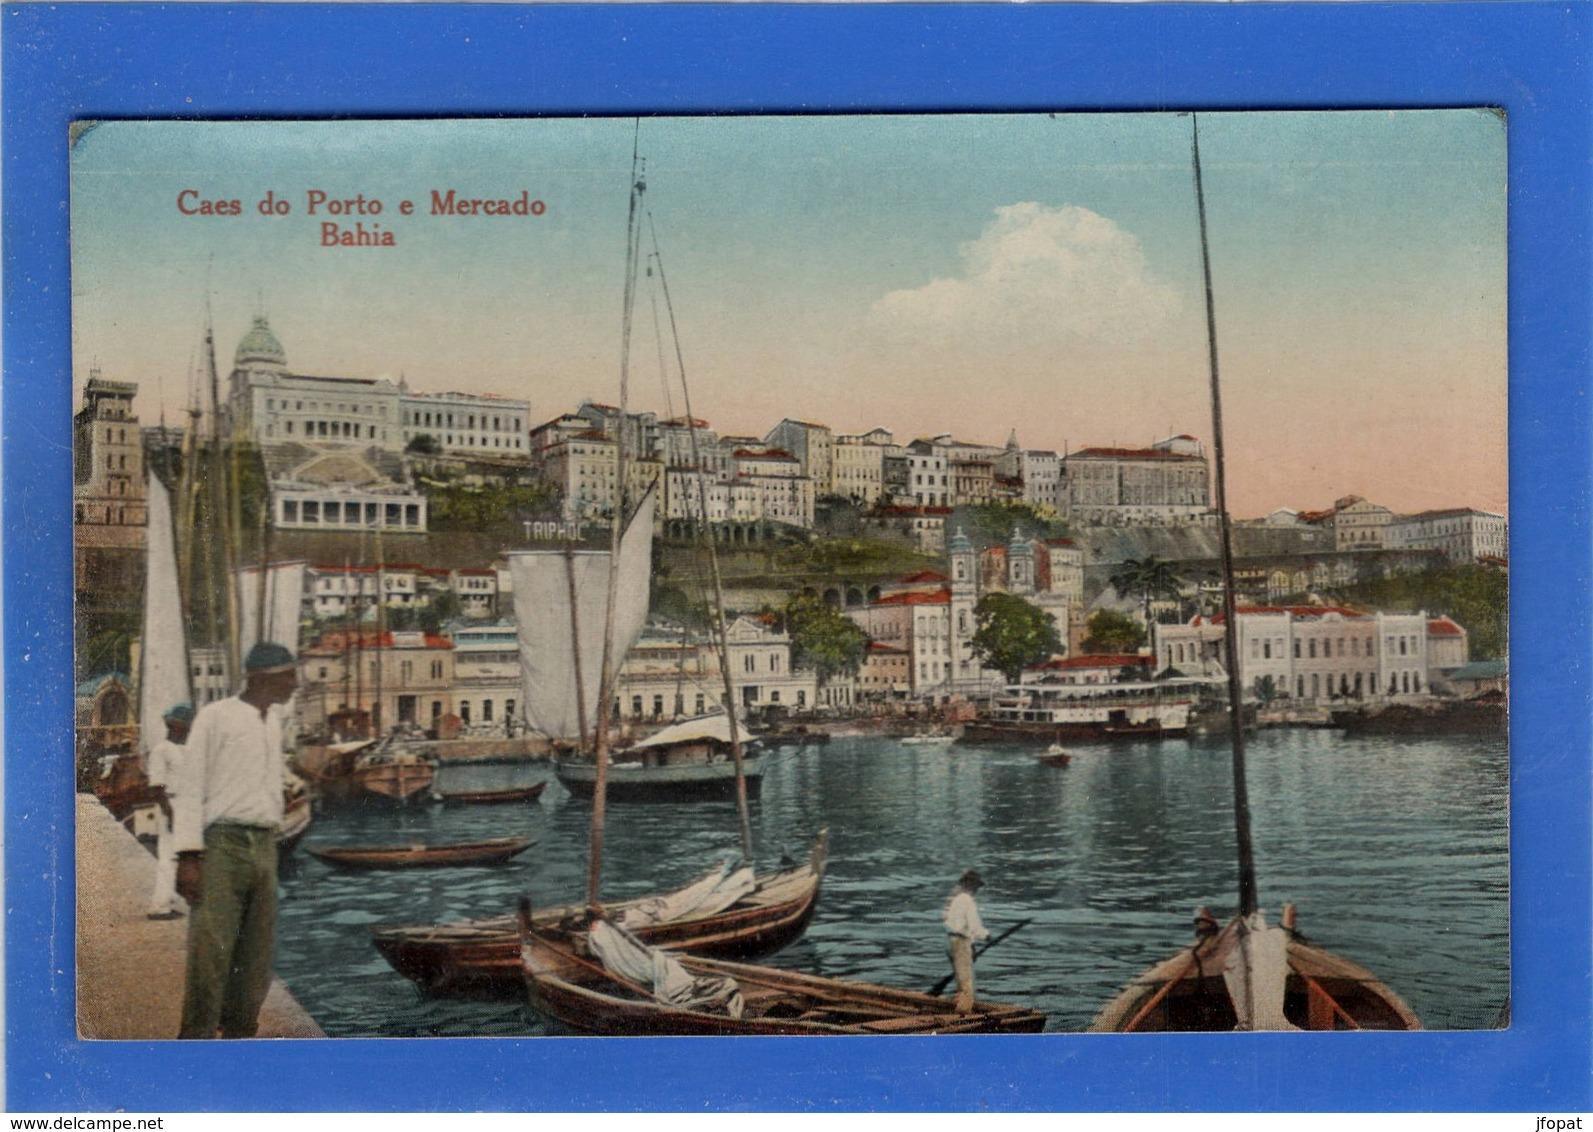 BRESIL - BAHIA Caes Do Porto E Mercado, Glacée Couleur - Salvador De Bahia